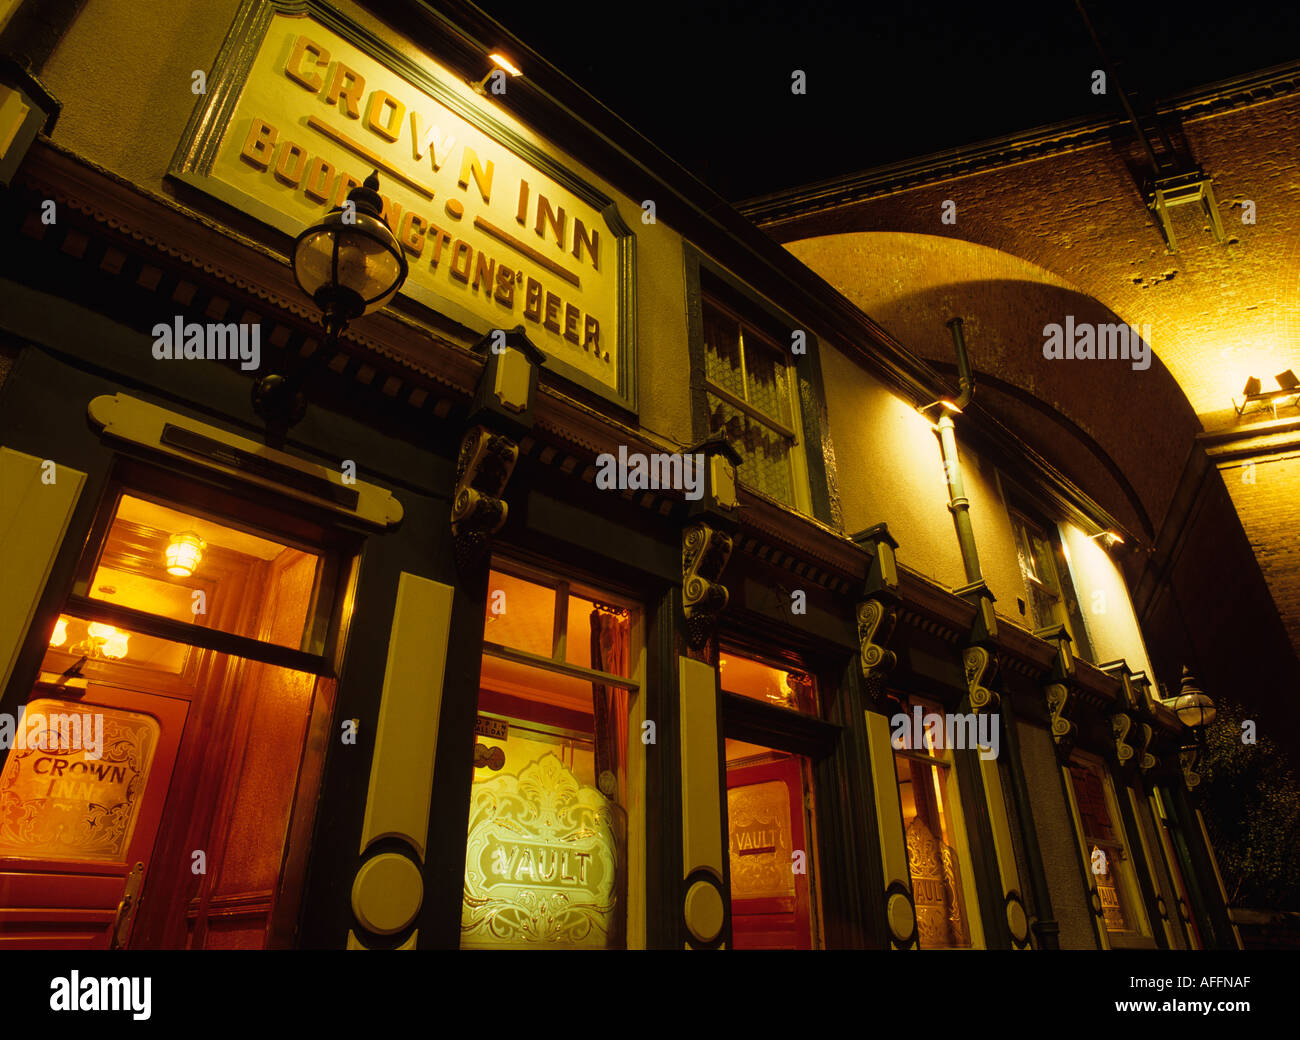 Cheshire Stockport Crown Inn below railway viaduct at night - Stock Image